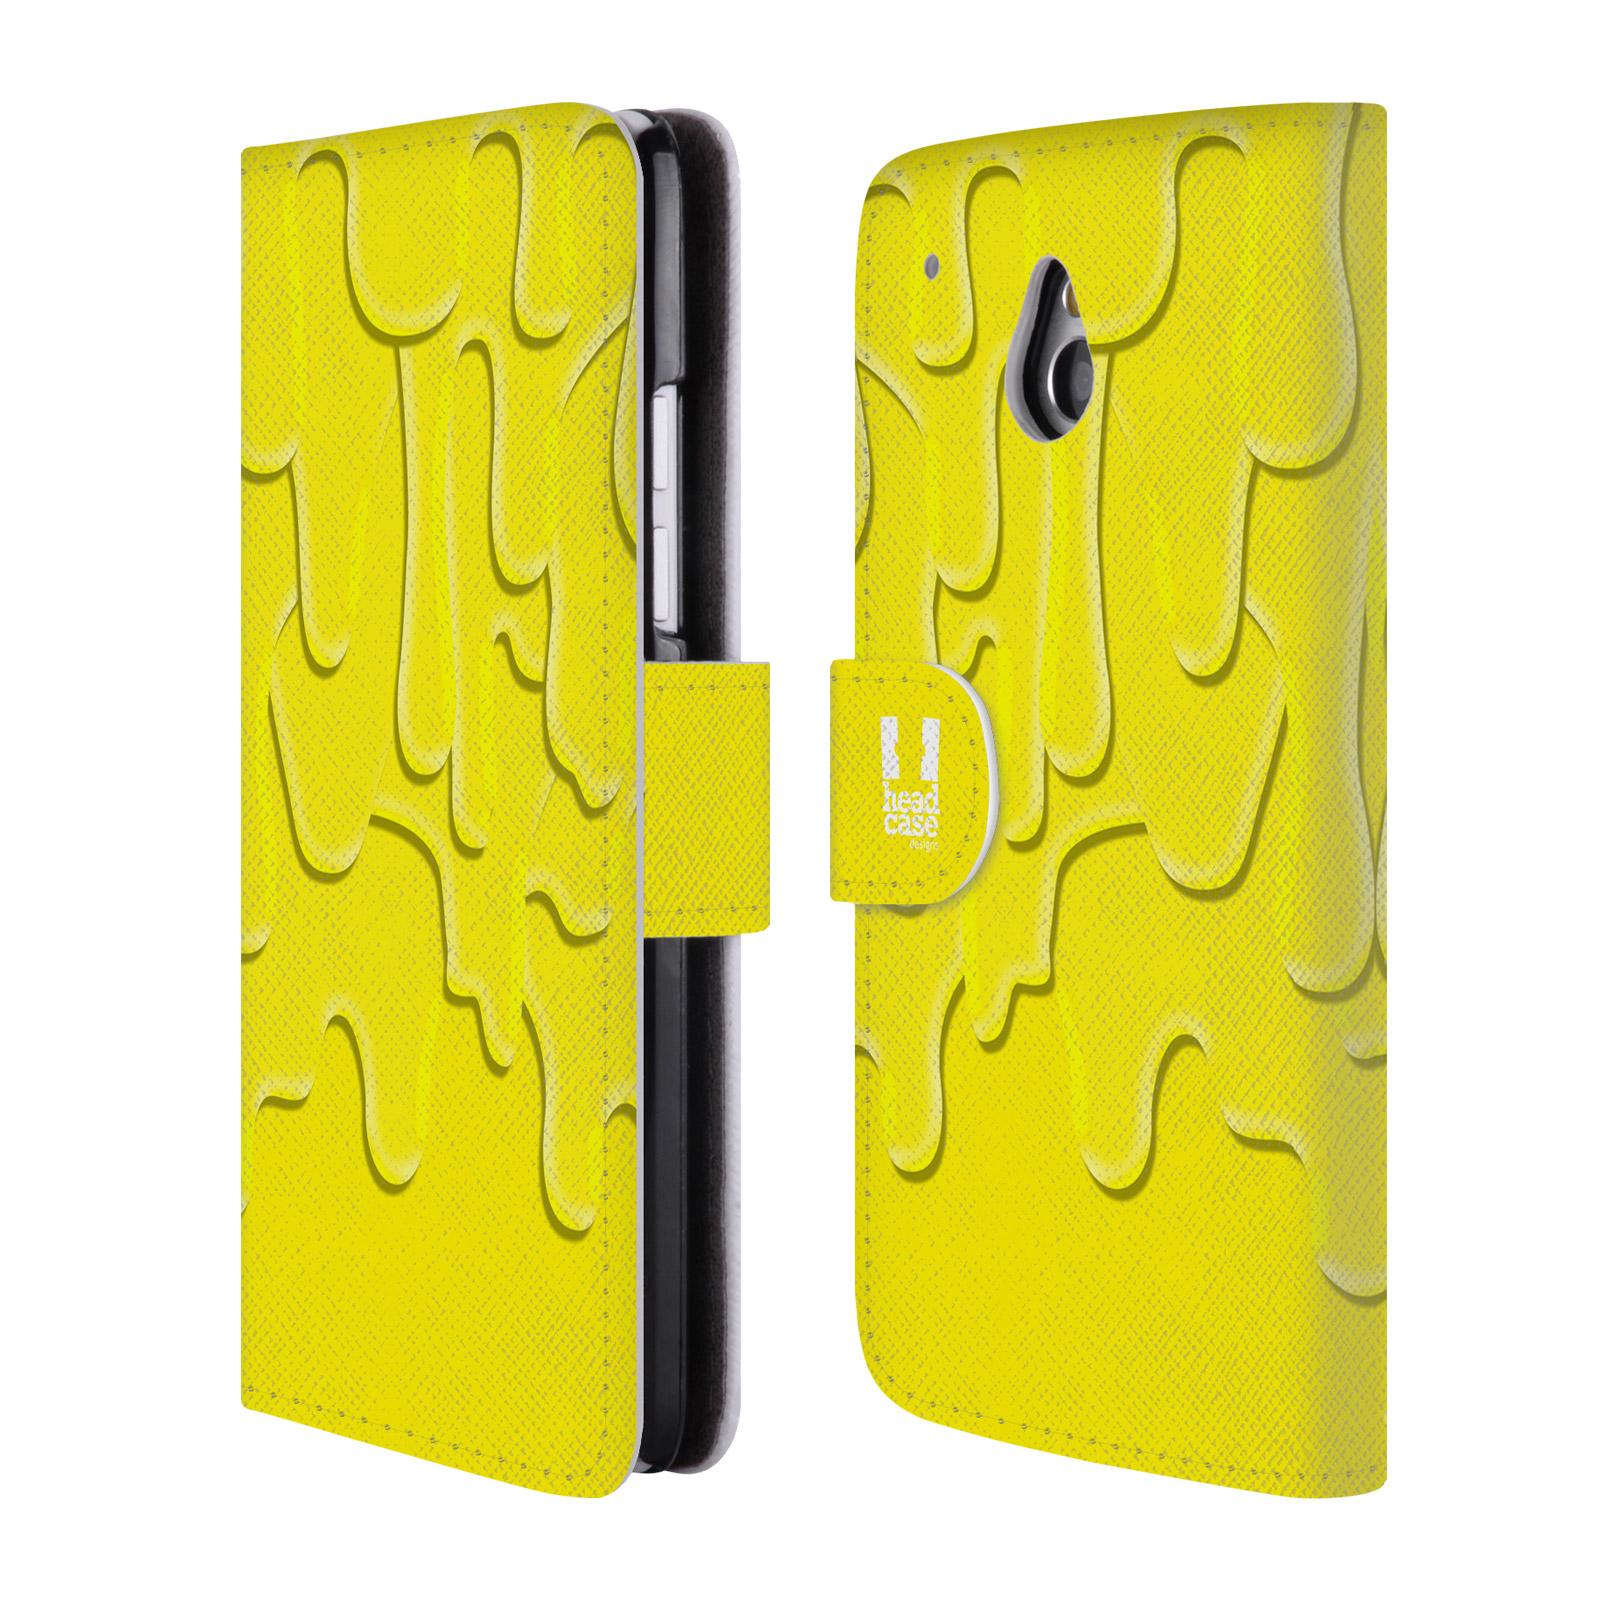 HEAD CASE Flipové pouzdro pro mobil HTC ONE MINI (M4) ZÁPLAVA BARVA žlutá